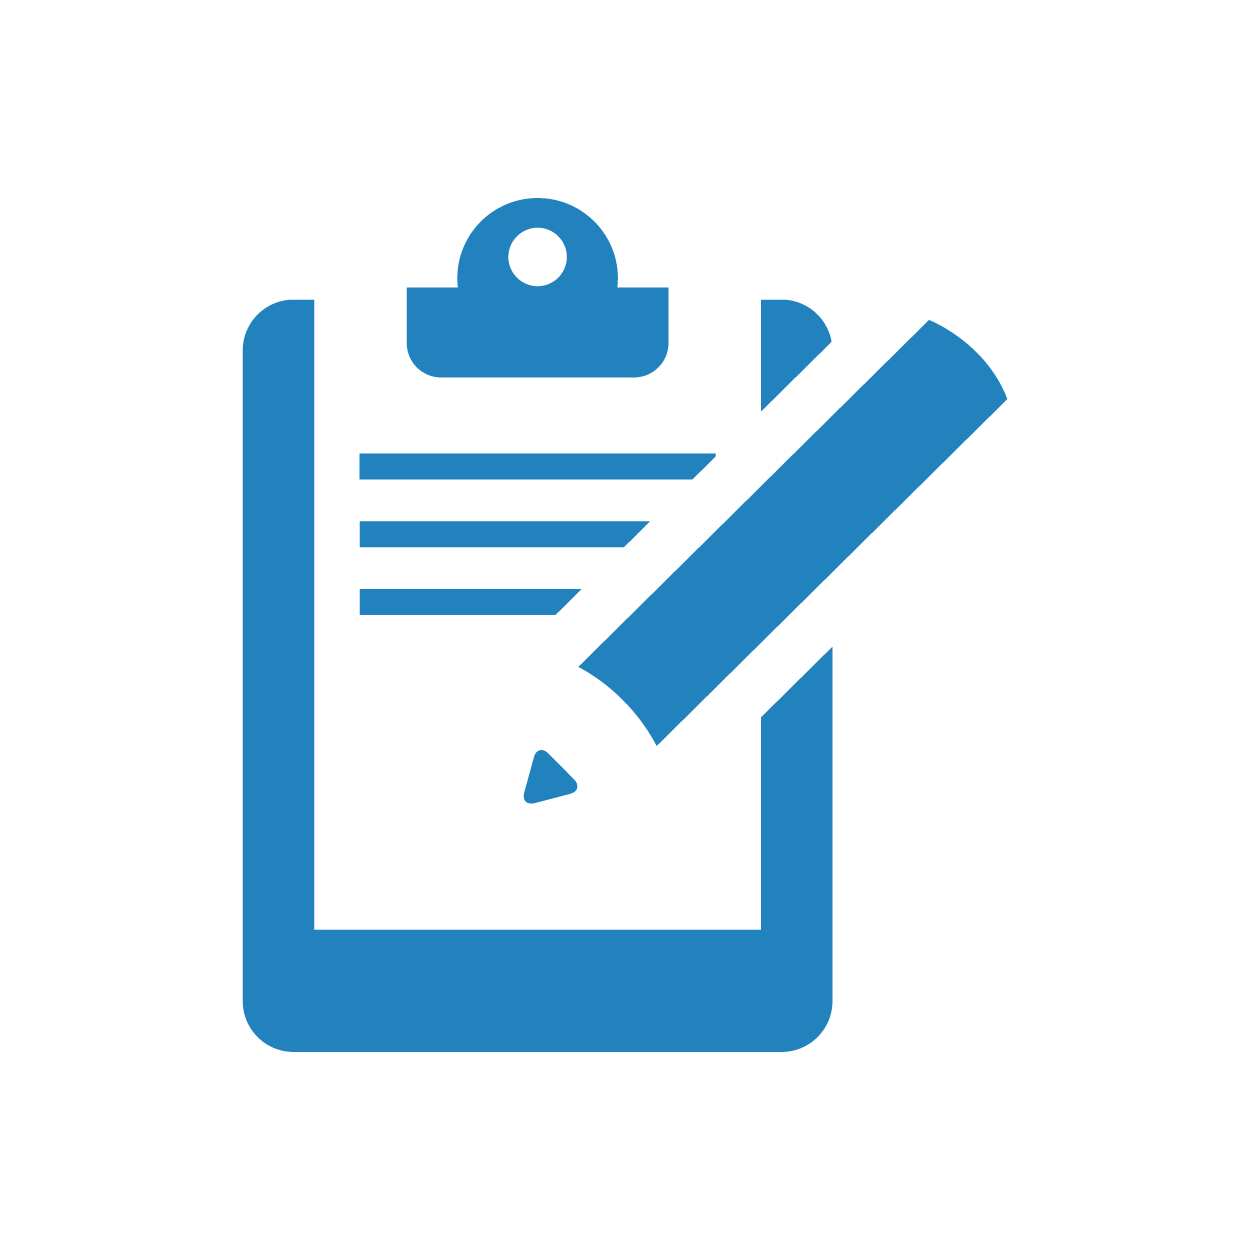 Clipboard clipart assessment. Contact centre assessments cspn